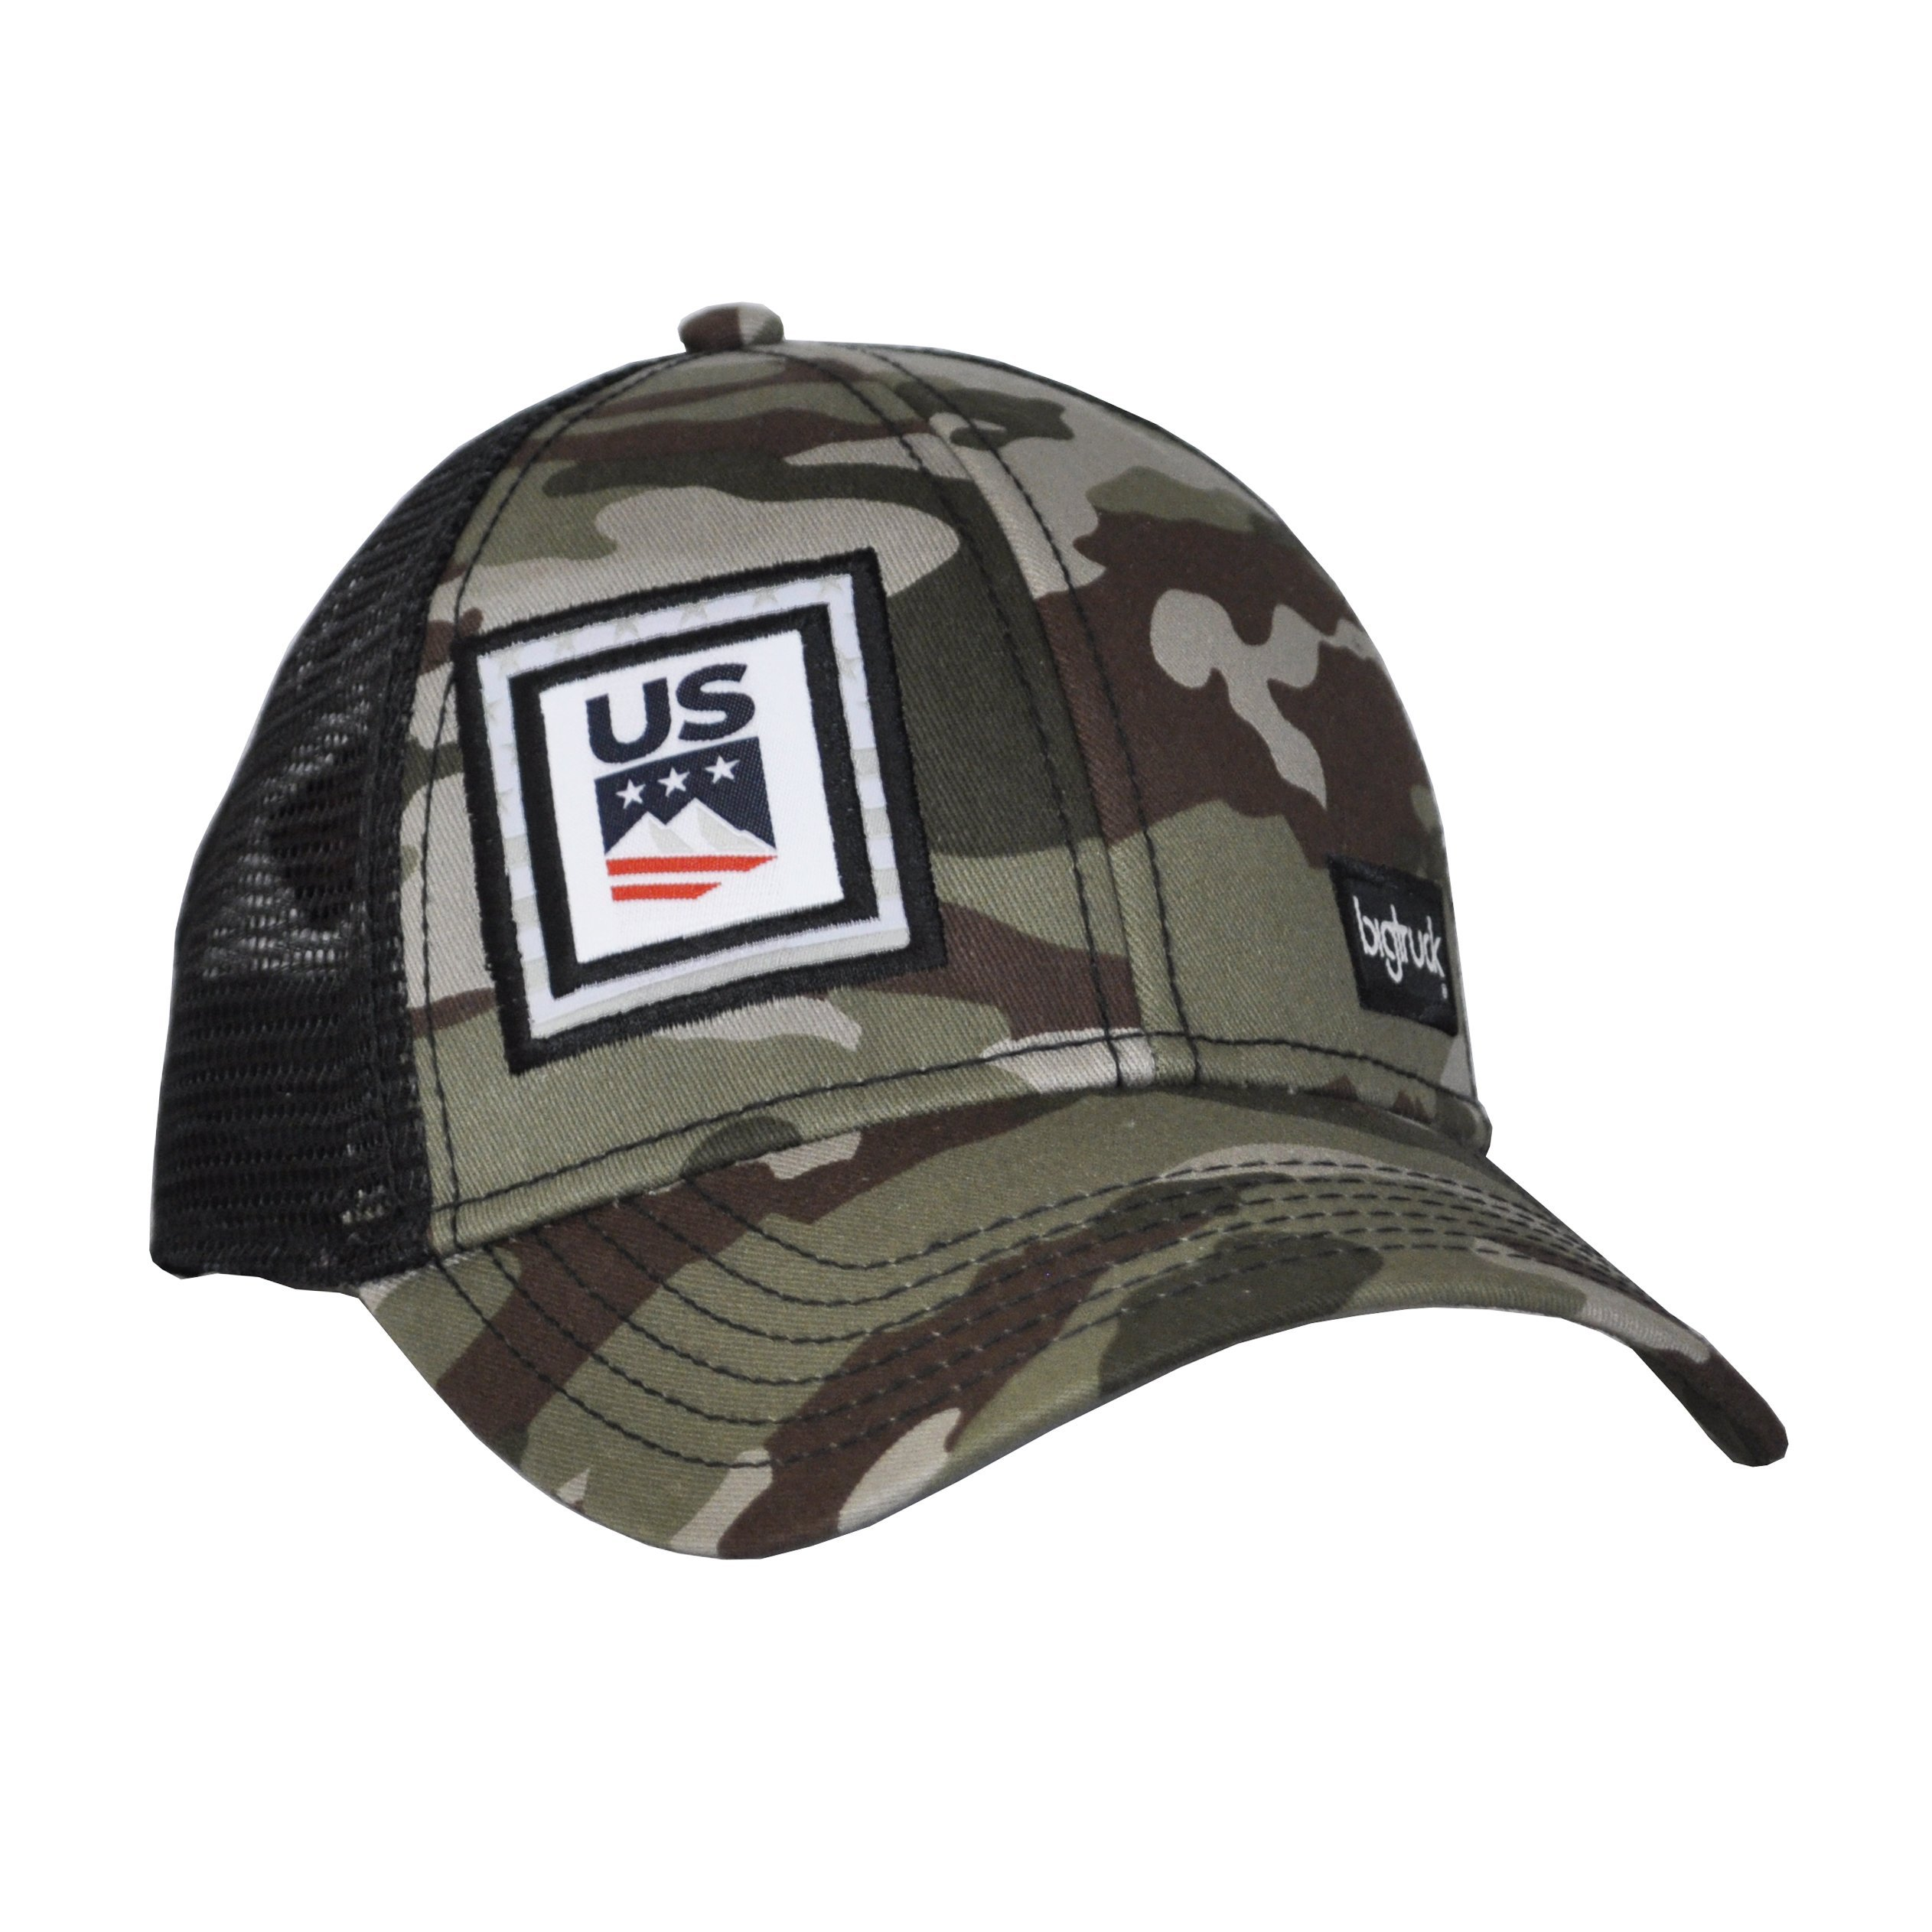 bigtruck U.S. Ski Team Classic Trucker Hat, Camo, Adult